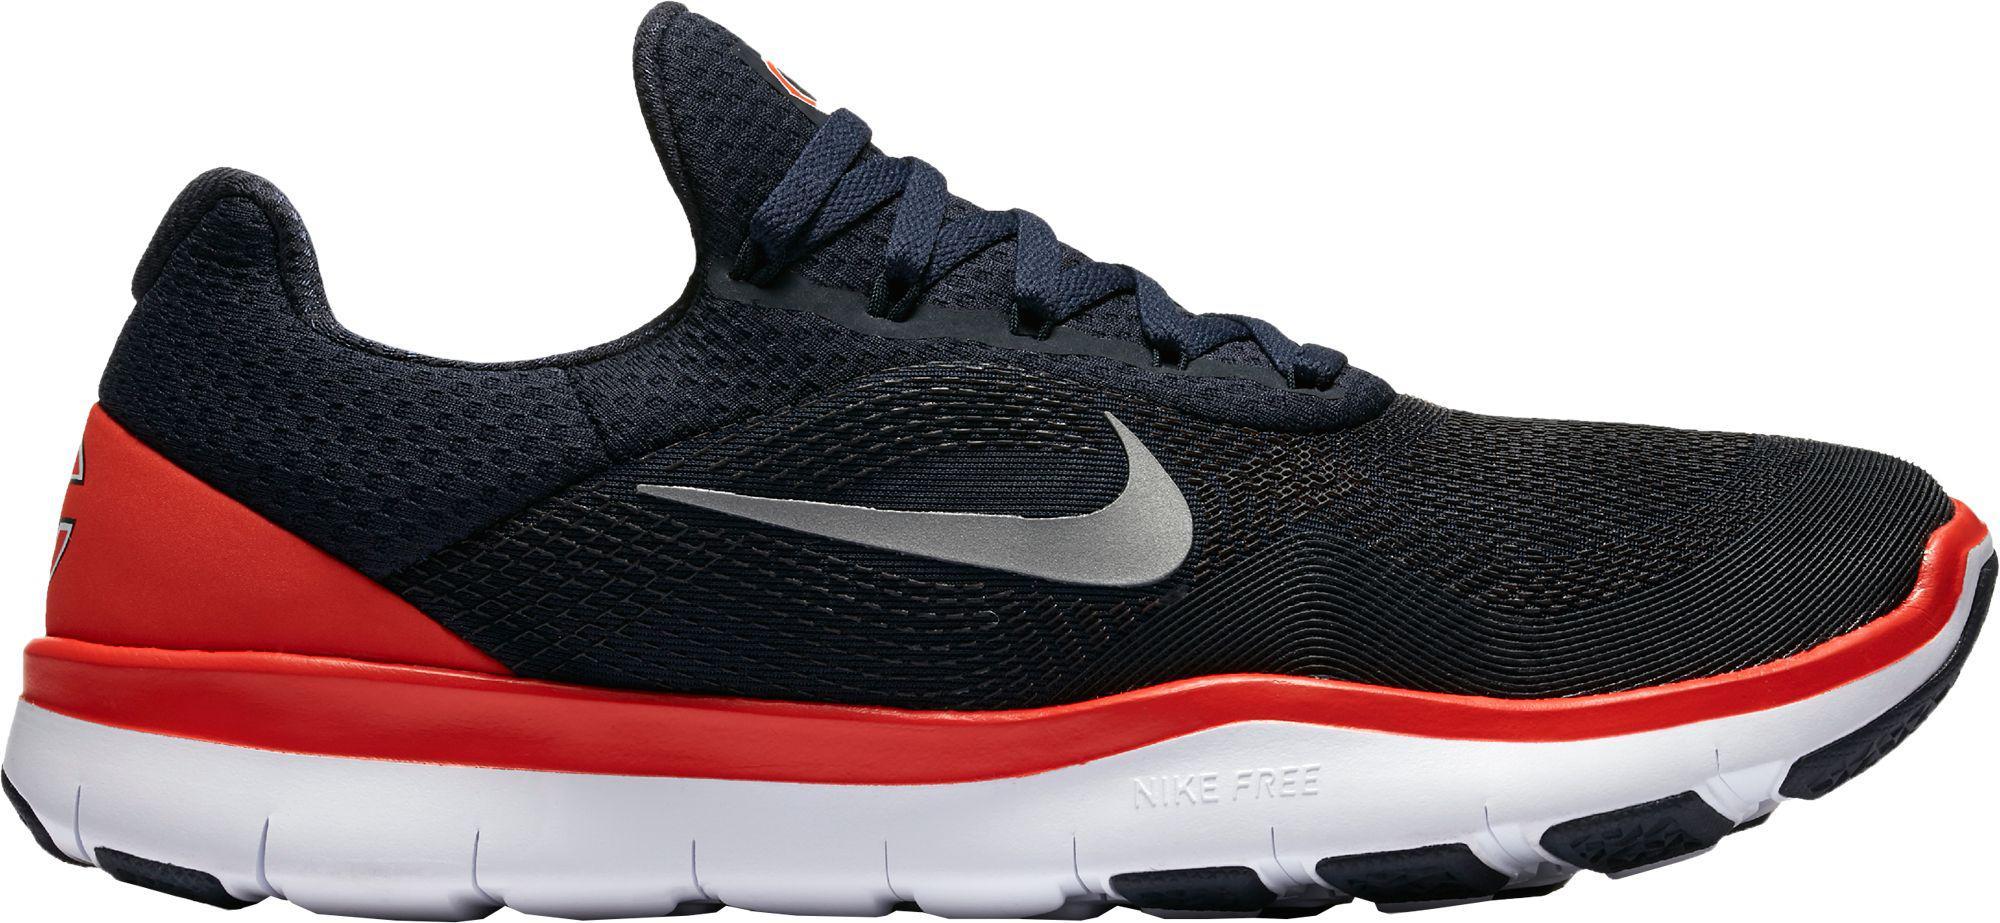 cheaper 02c17 4689a Nike - Blue Free Trainer V7 Nfl Bears Training Shoes for Men - Lyst